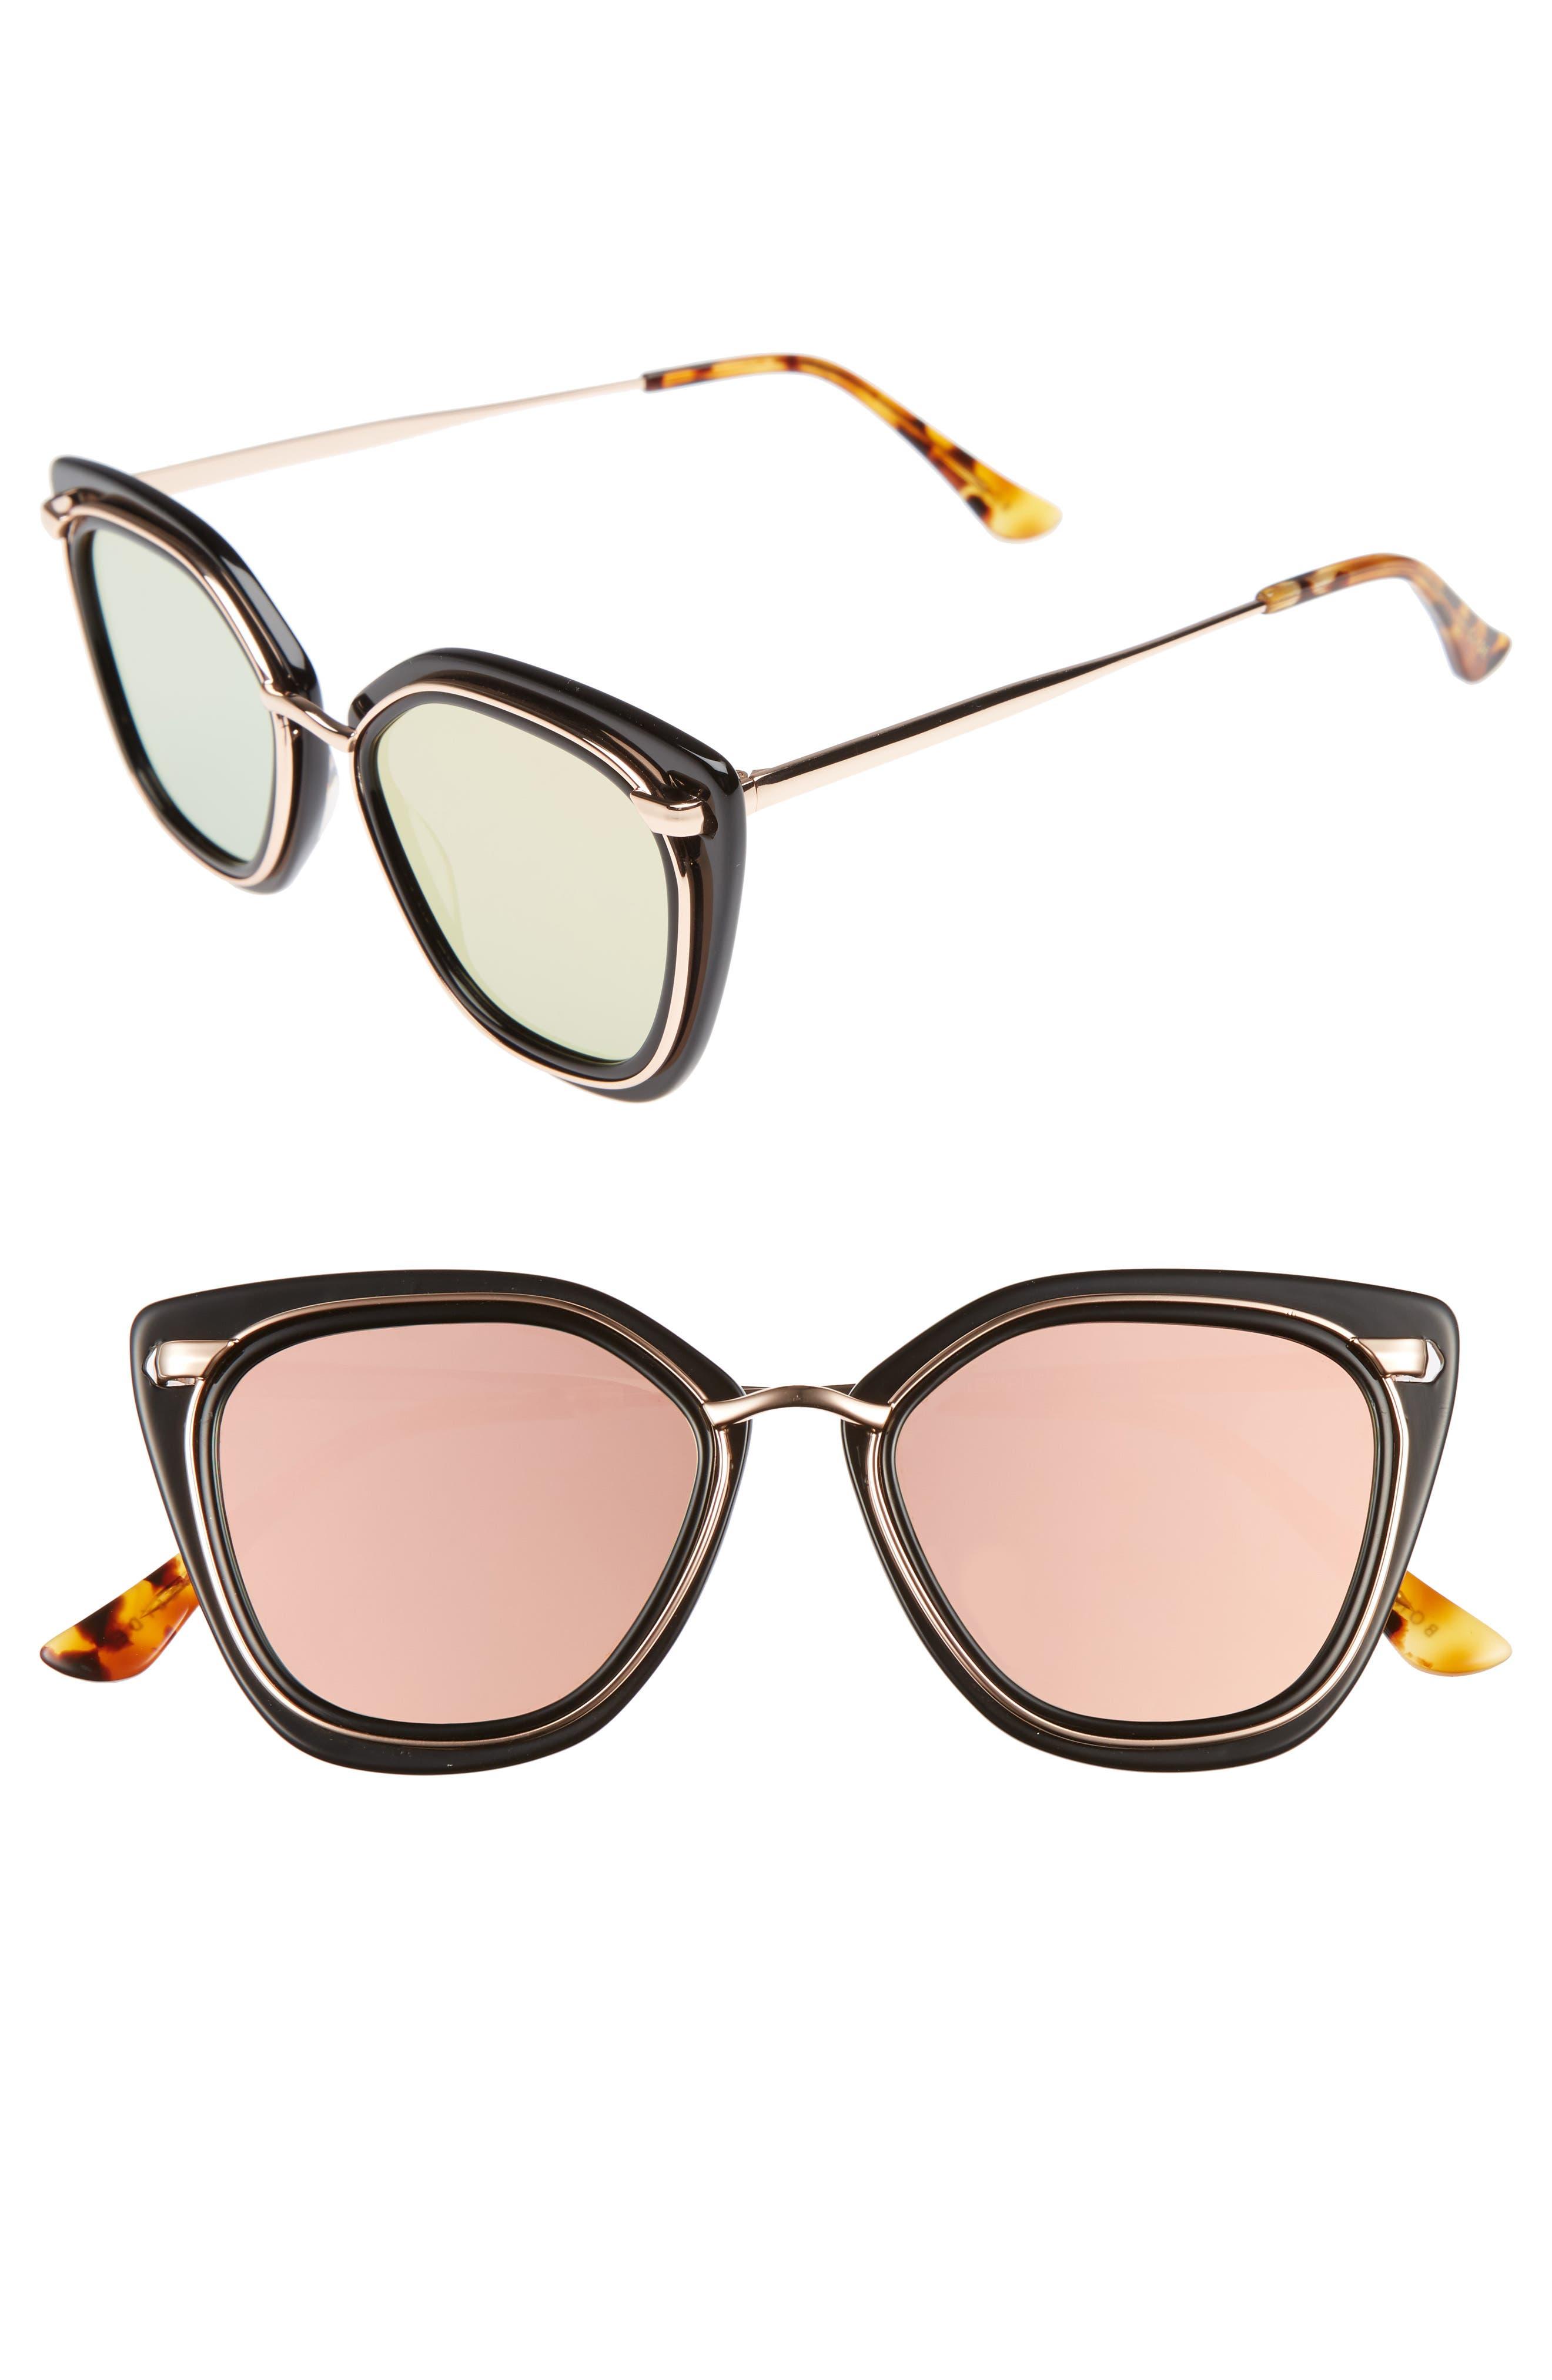 Temple 52mm Sunglasses,                             Main thumbnail 1, color,